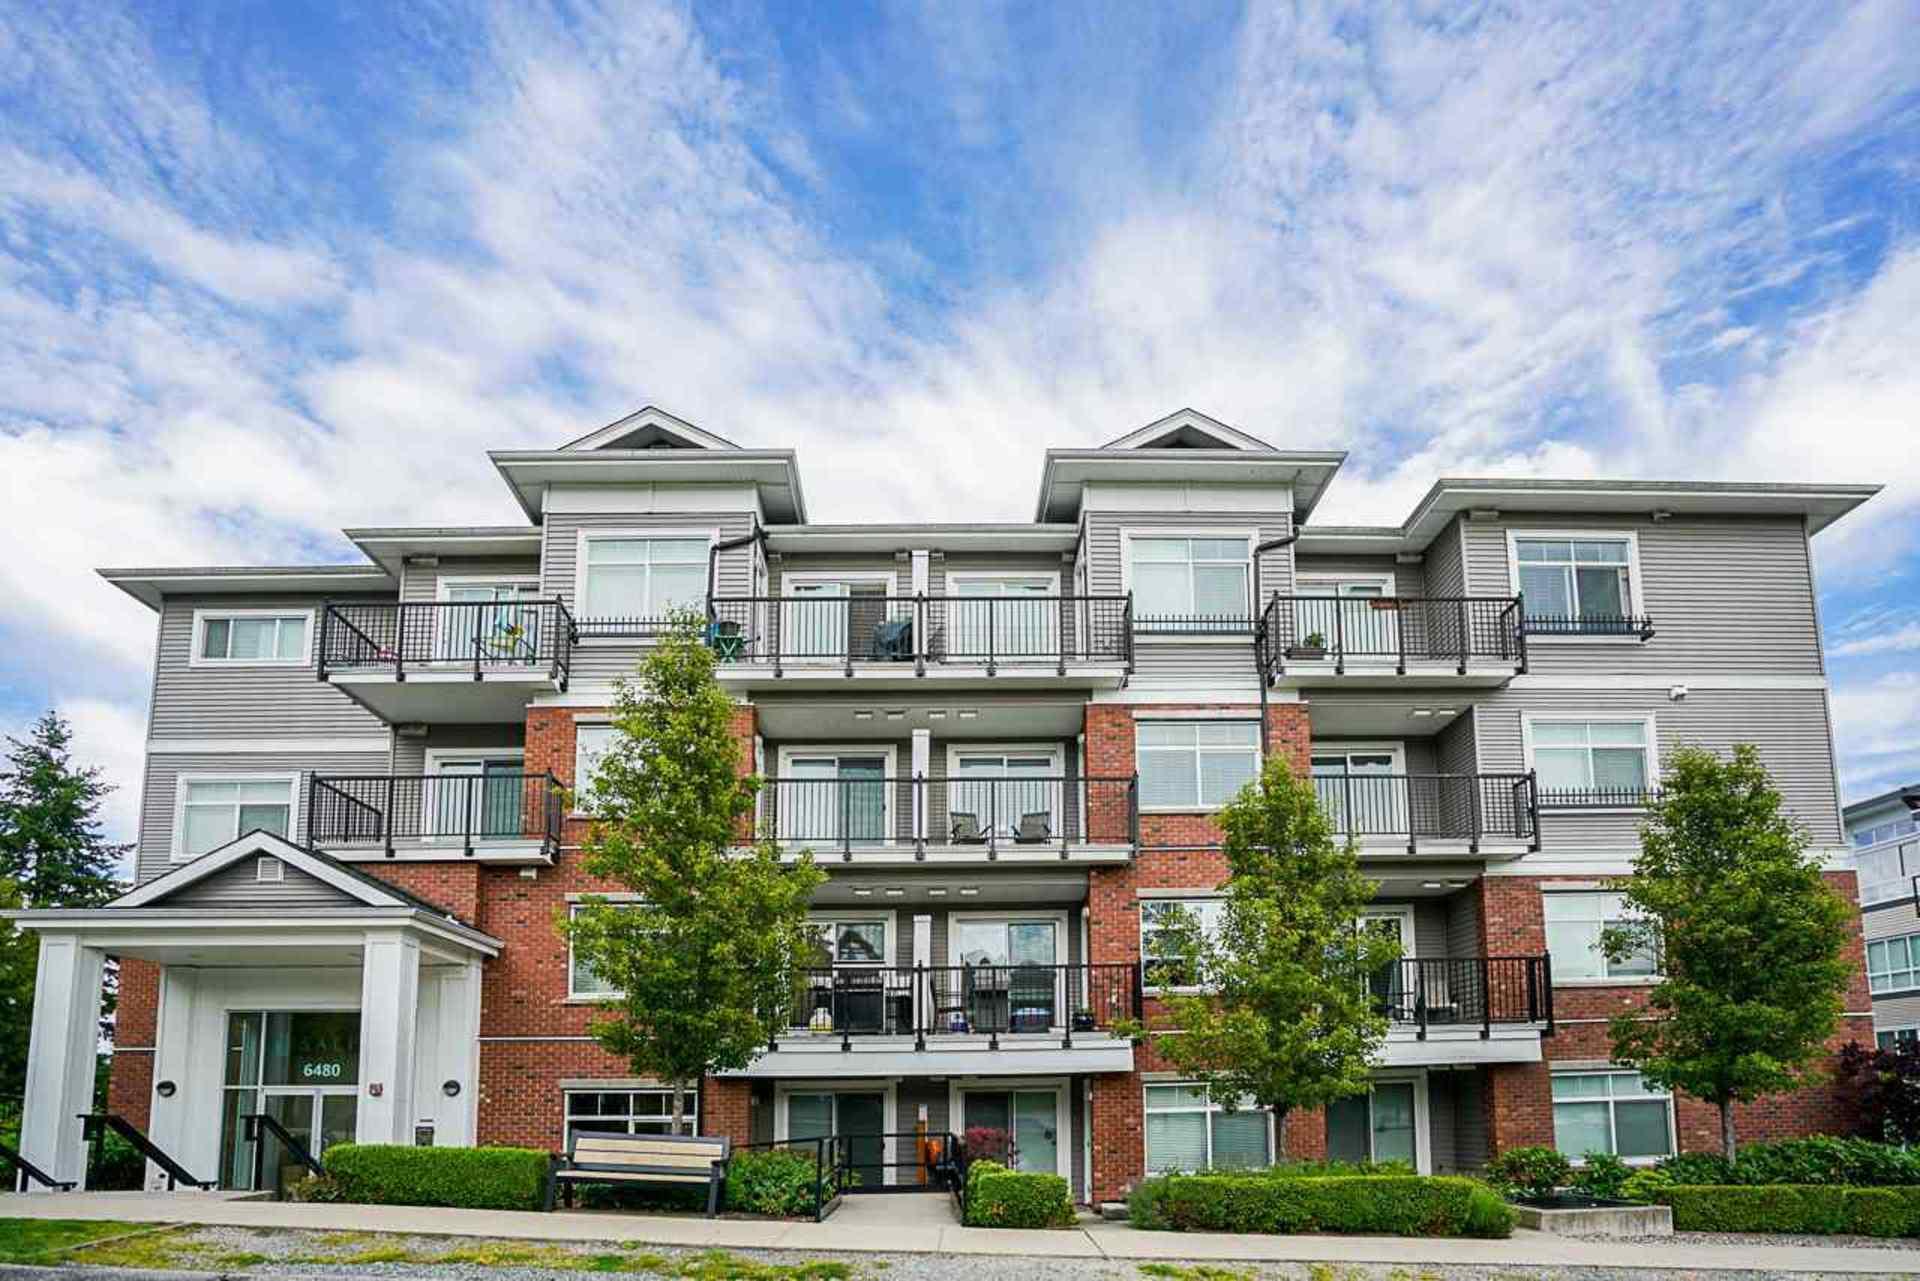 6480-195a-street-clayton-cloverdale-21 of 203 - 6480 195a Street, Clayton, Cloverdale